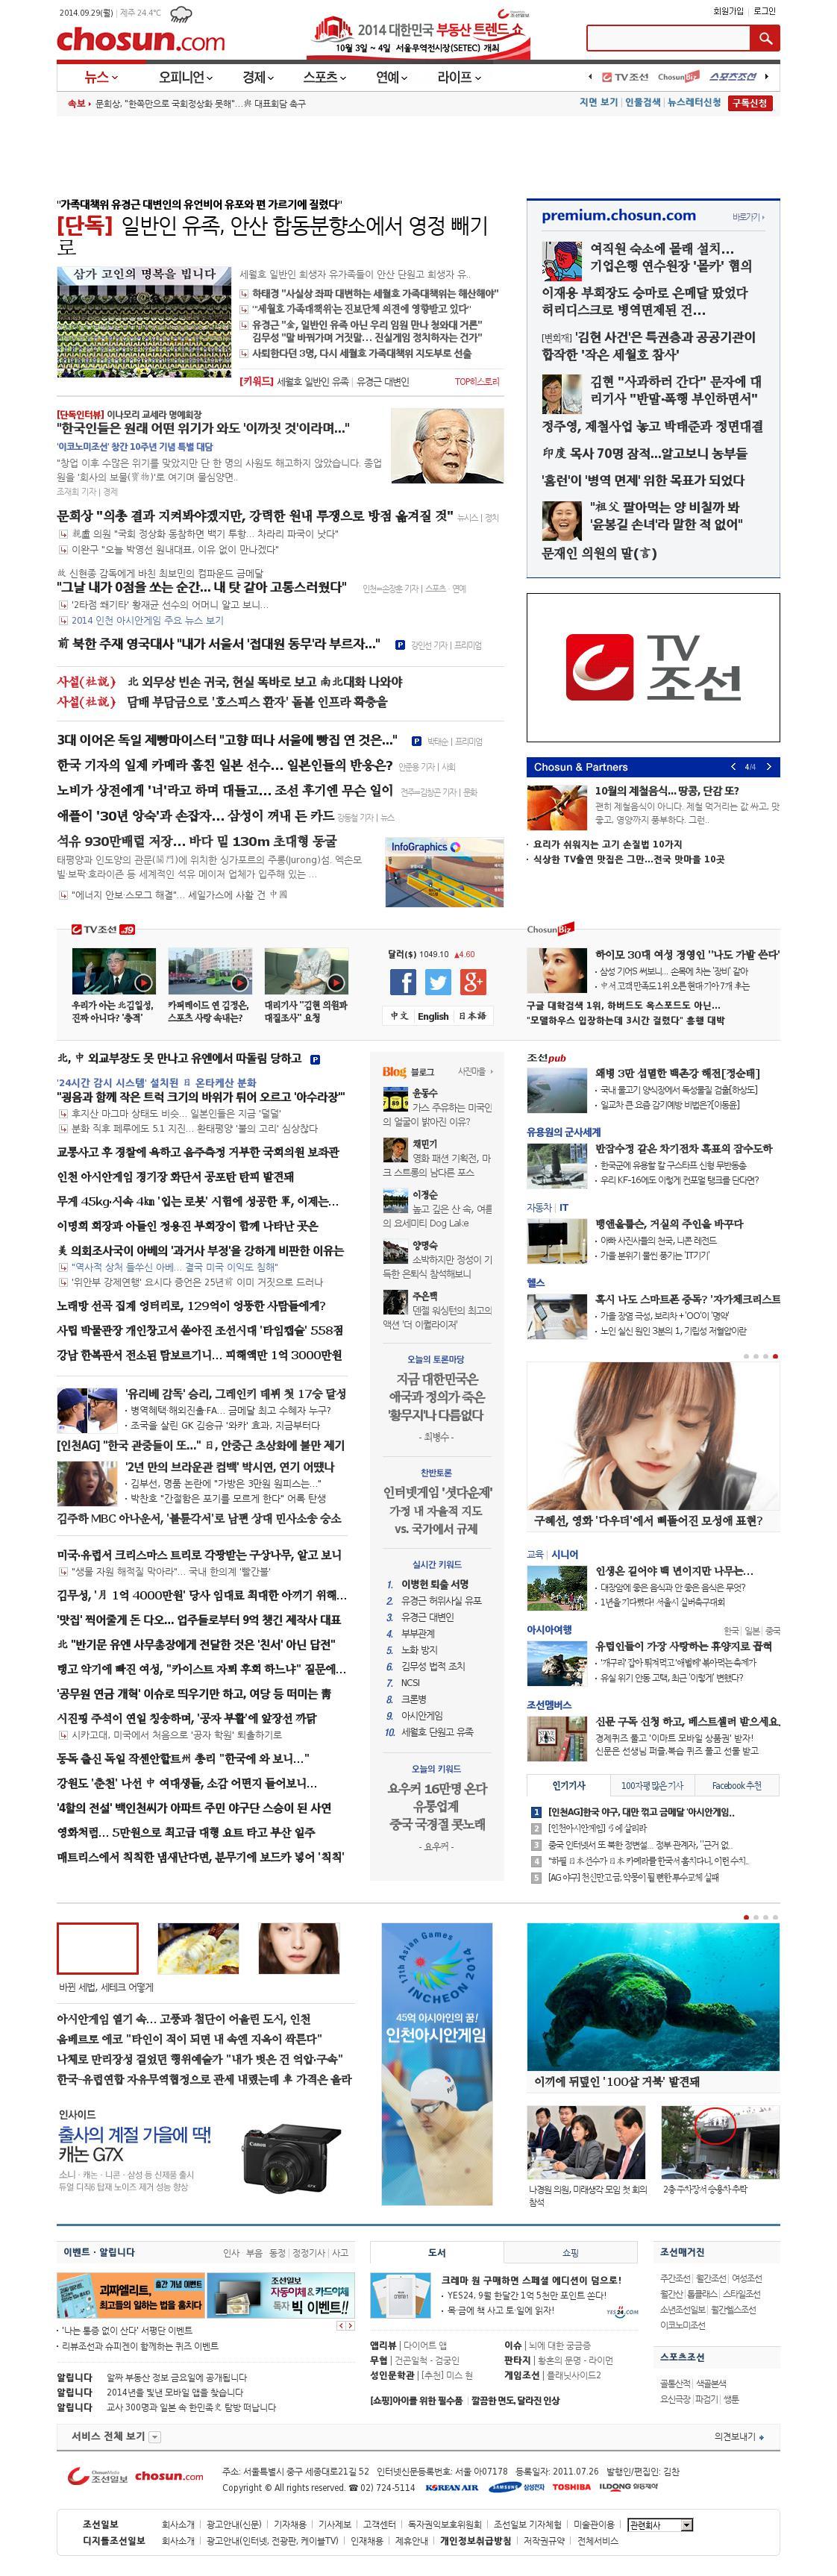 chosun.com at Monday Sept. 29, 2014, 1:02 a.m. UTC